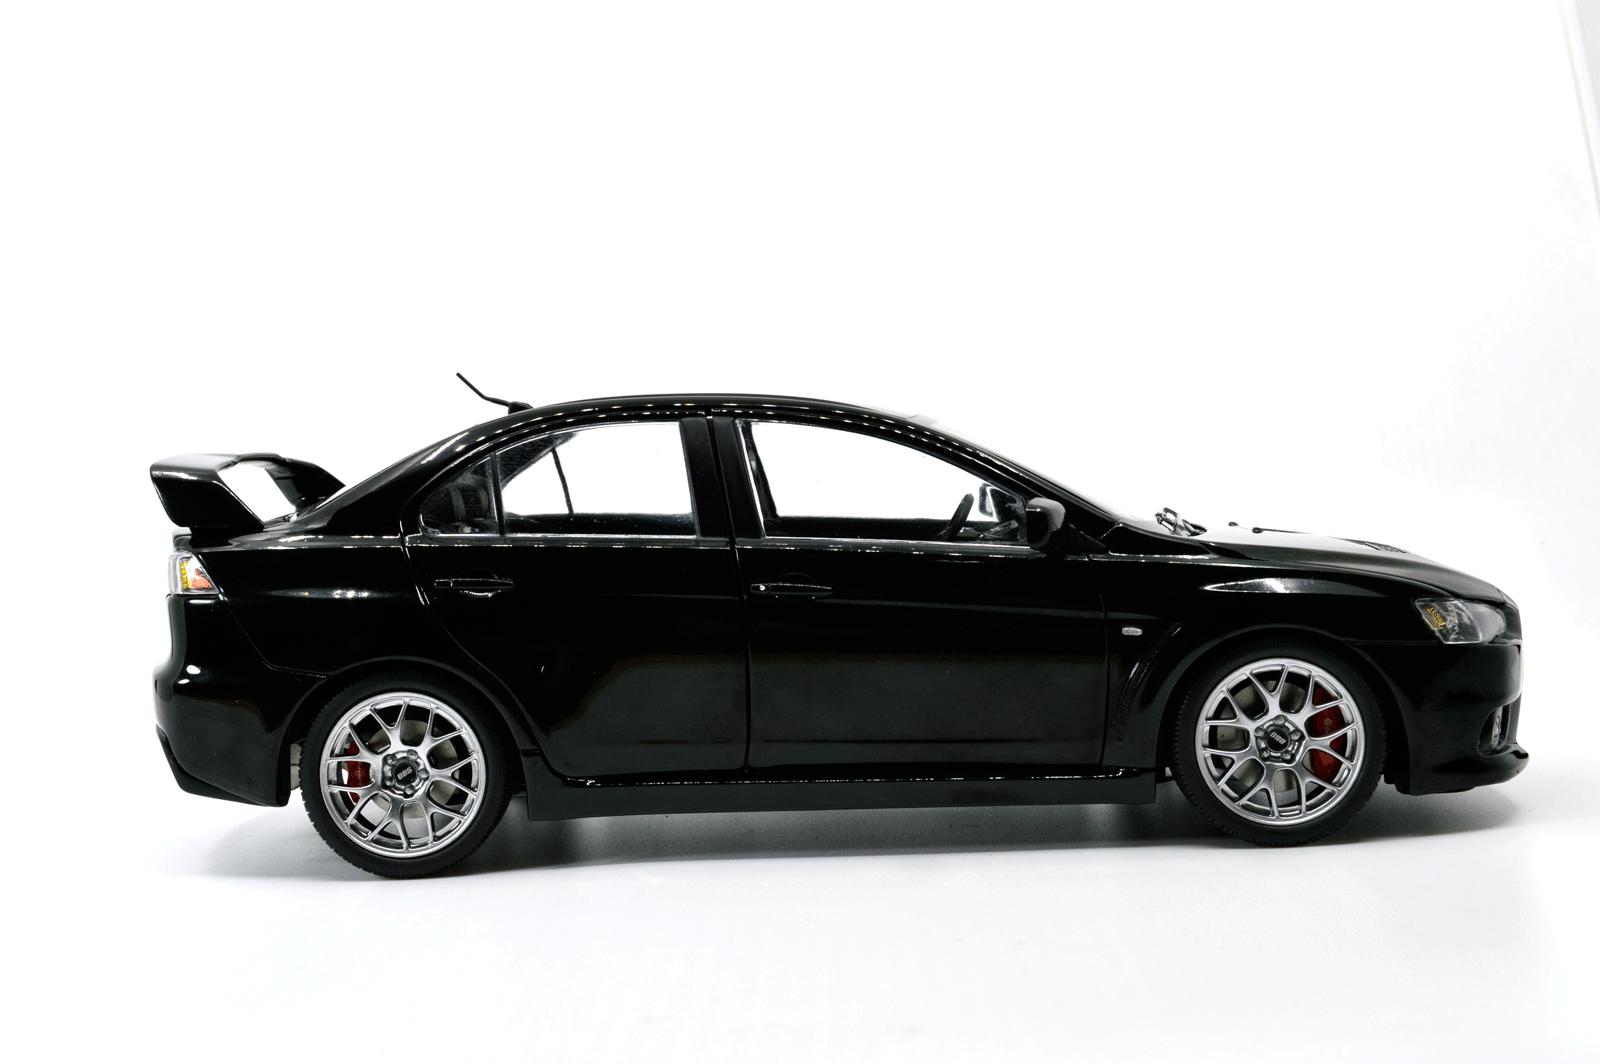 1:18 Scale Mitsubishi Lancer Evolution X 6